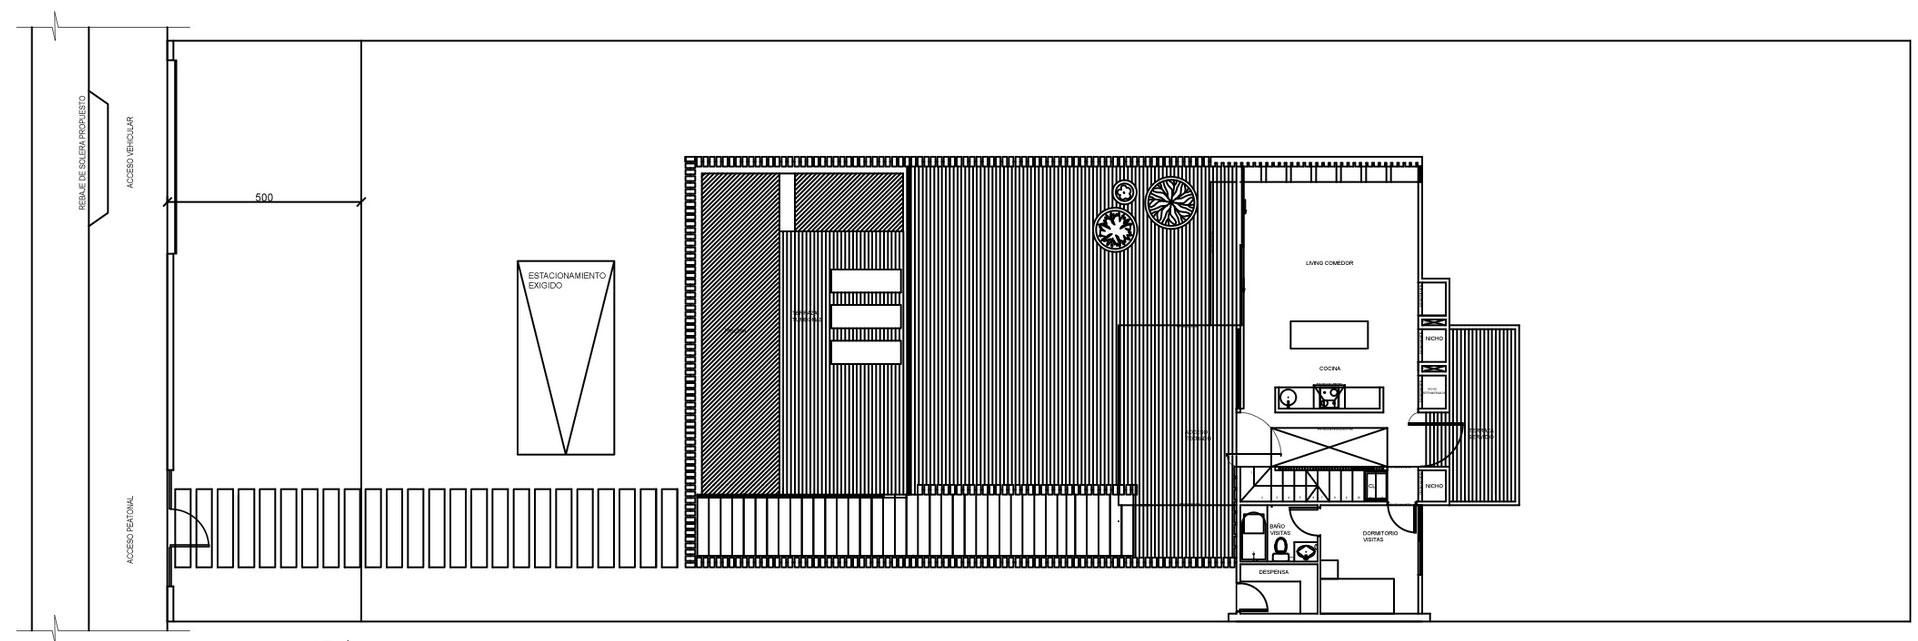 Ground Floor Plan, Family Home in Algarrobo, Chile